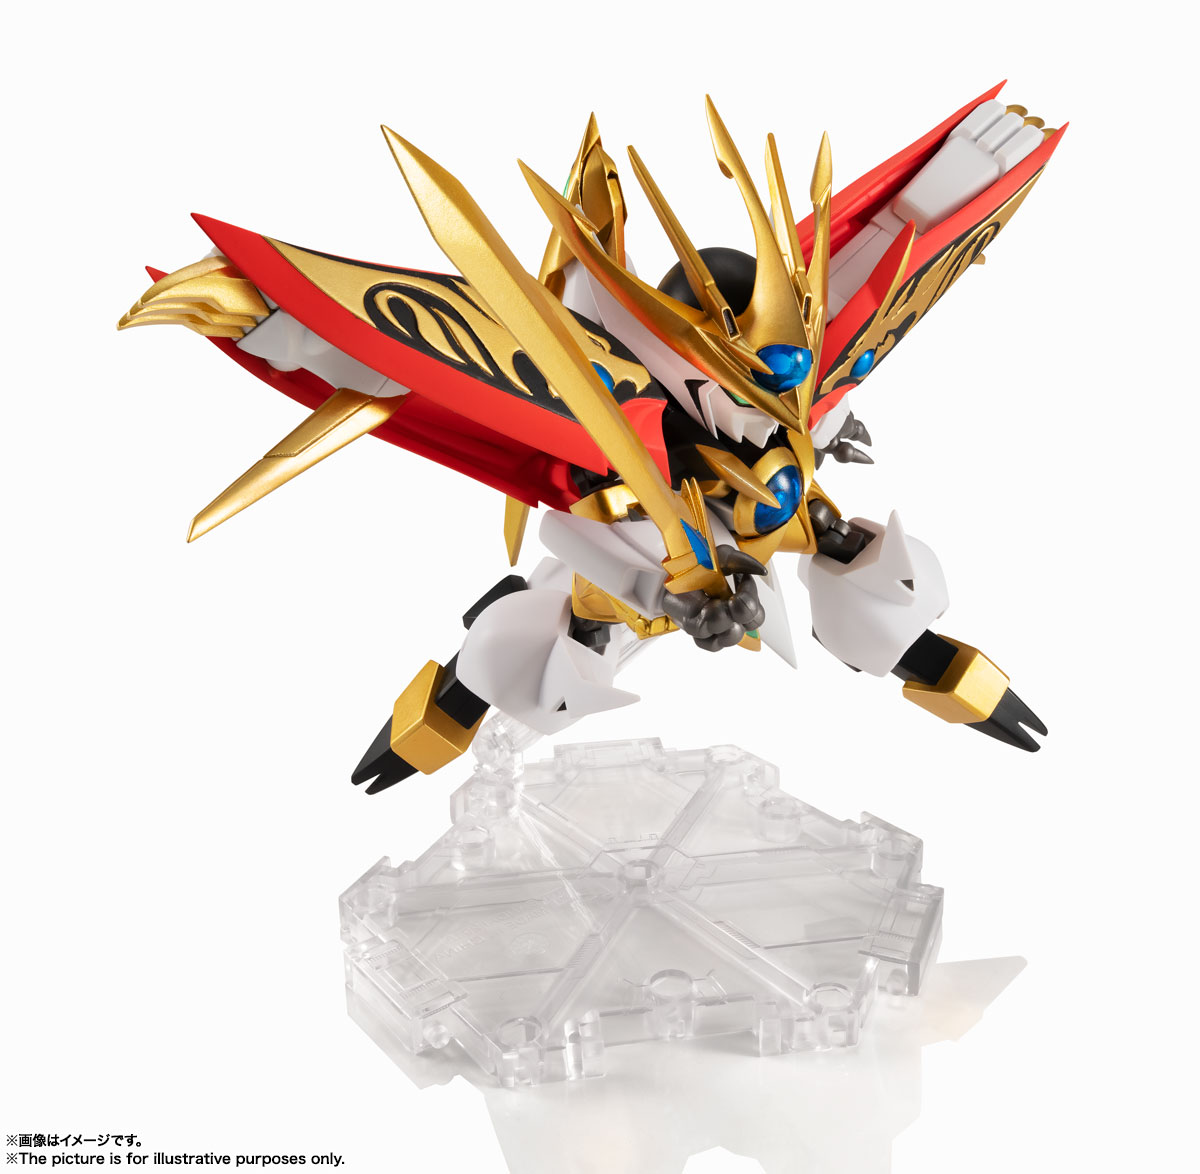 NXEDGE STYLE[MASHIN UNIT]『煌龍丸』魔神英雄伝ワタル 可動フィギュア-011